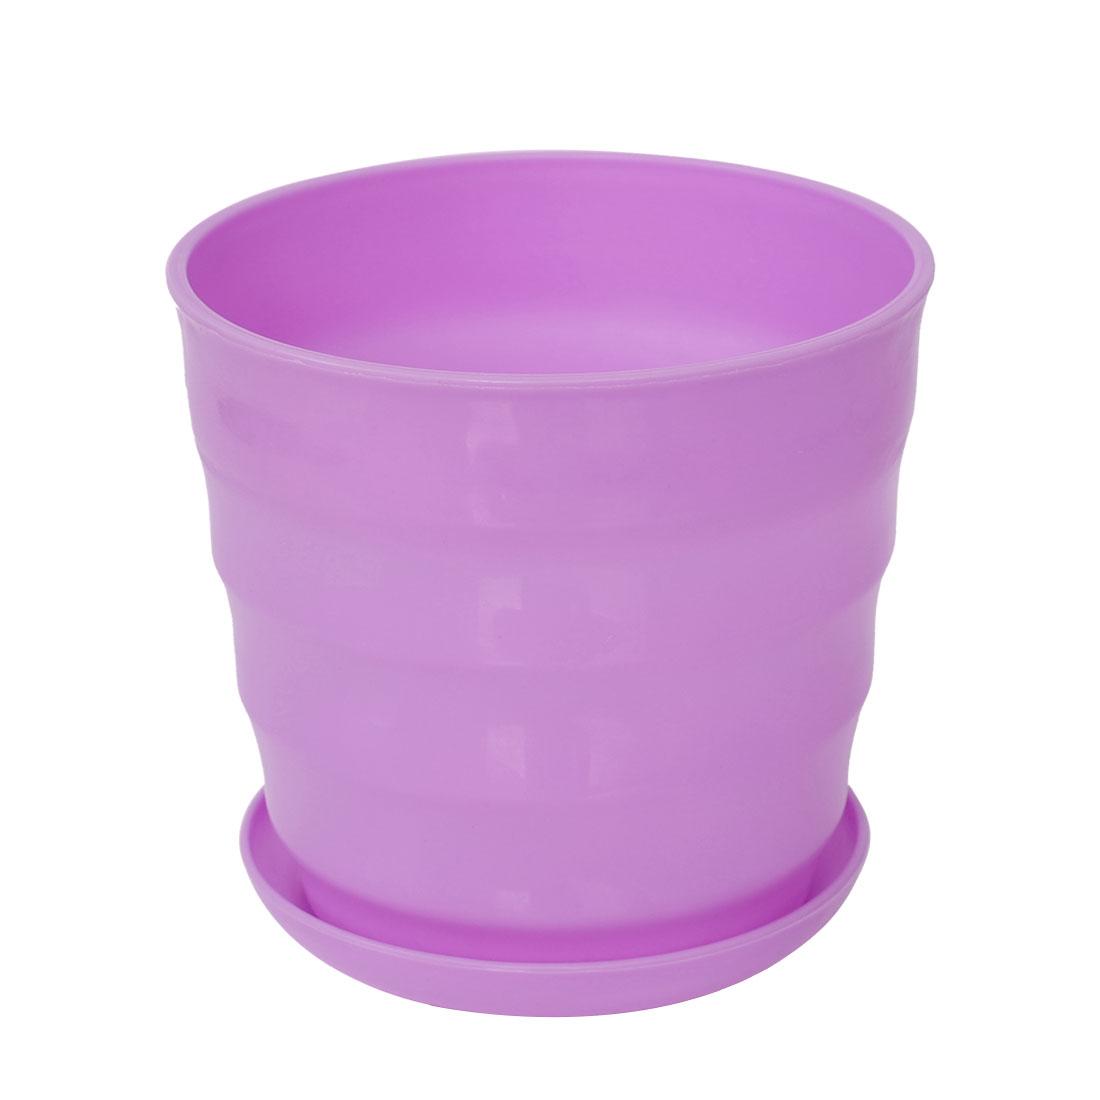 Home Garden Patio Office Plastic Stripe Pattern Plant Flower Holder Pot Purple